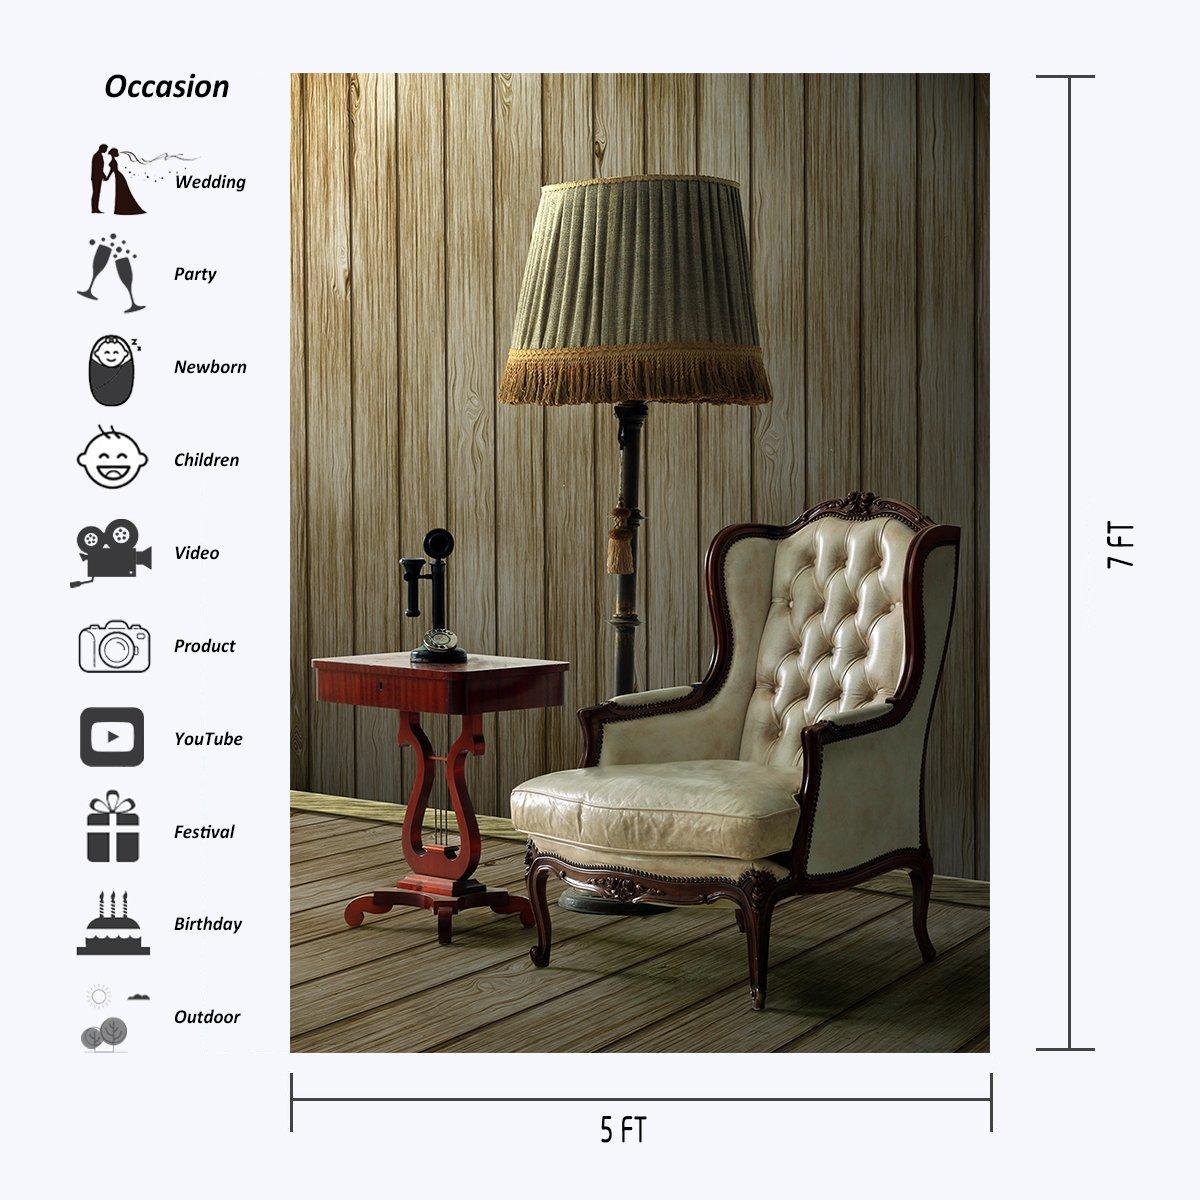 Tel N De Fondo De Fondo De Fotograf A De Poli Ster 5 7ft Muebles  # Gebrauchte Muebles